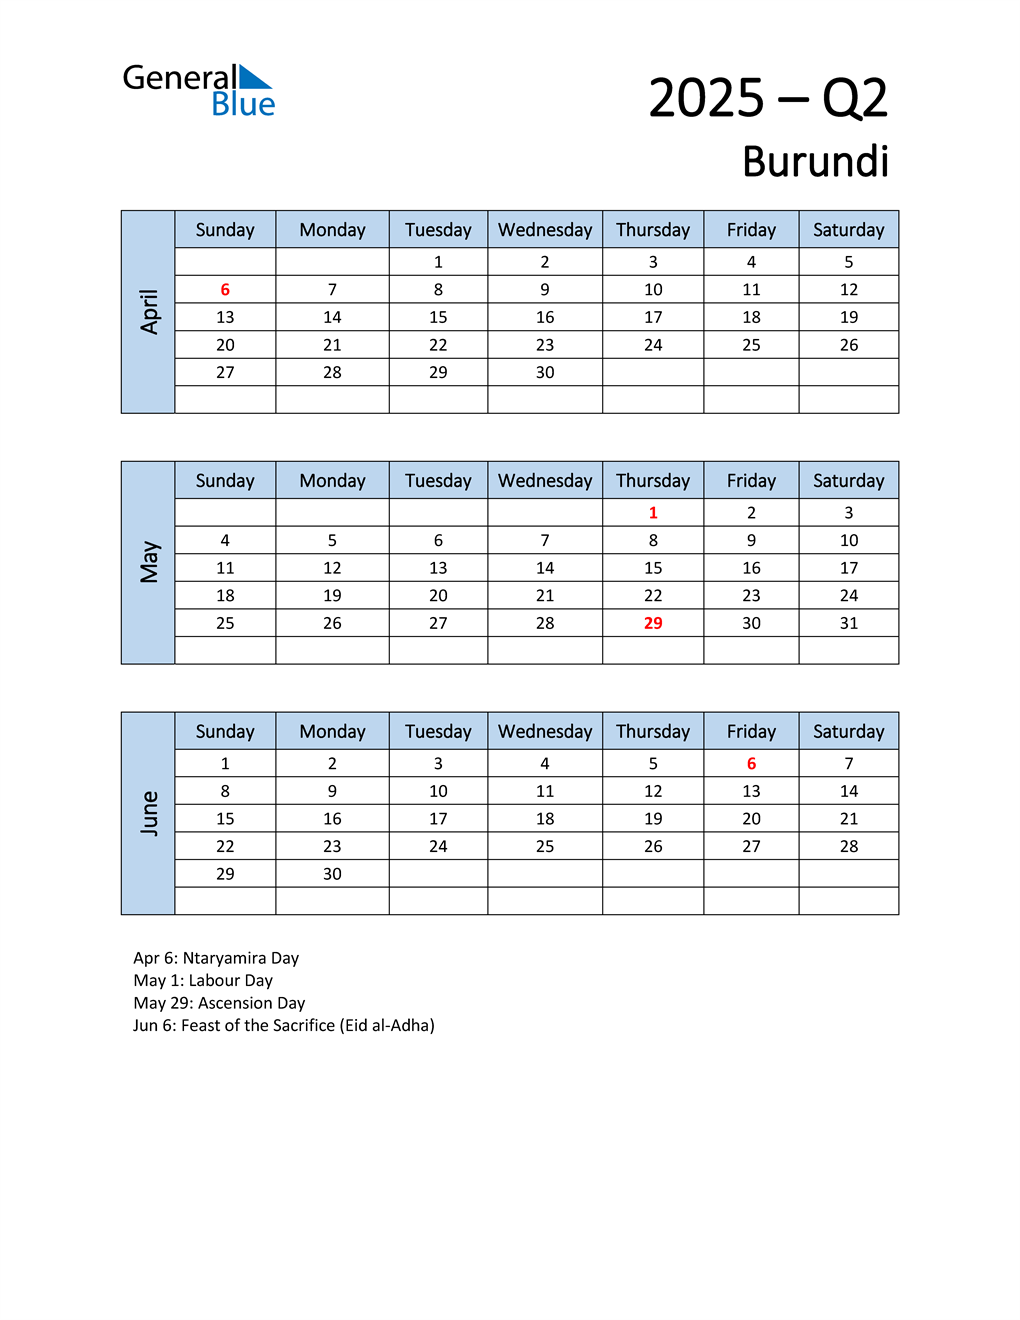 Free Q2 2025 Calendar for Burundi